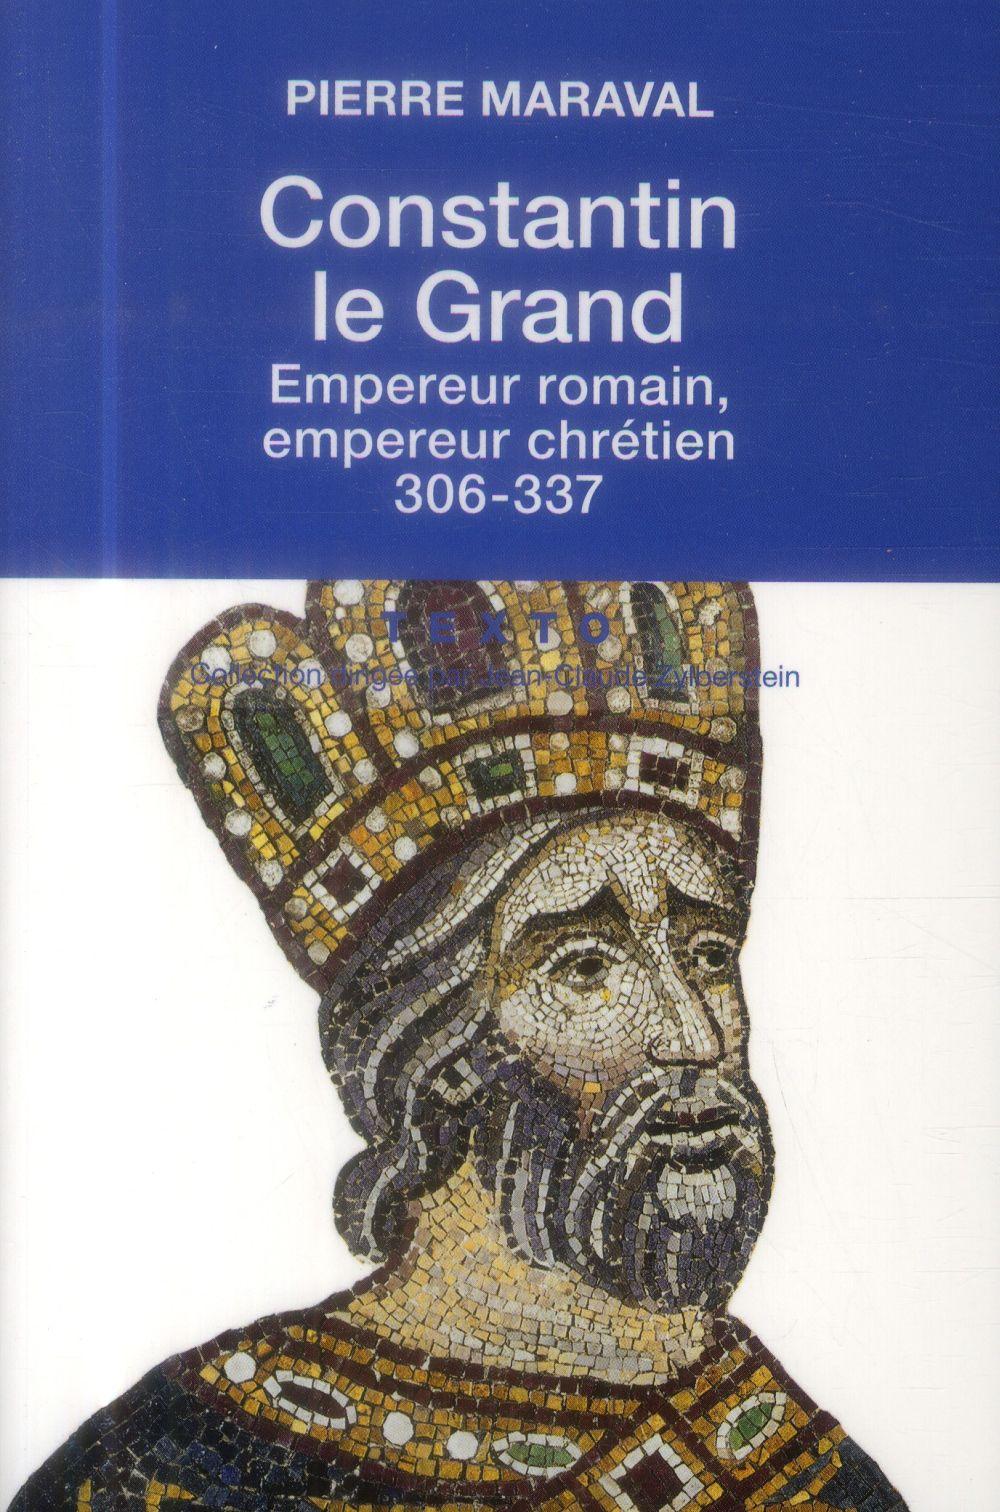 CONSTANTIN LE GRAND, EMPEREUR ROMAN, EMPEREUR CHRETIEN 306-337